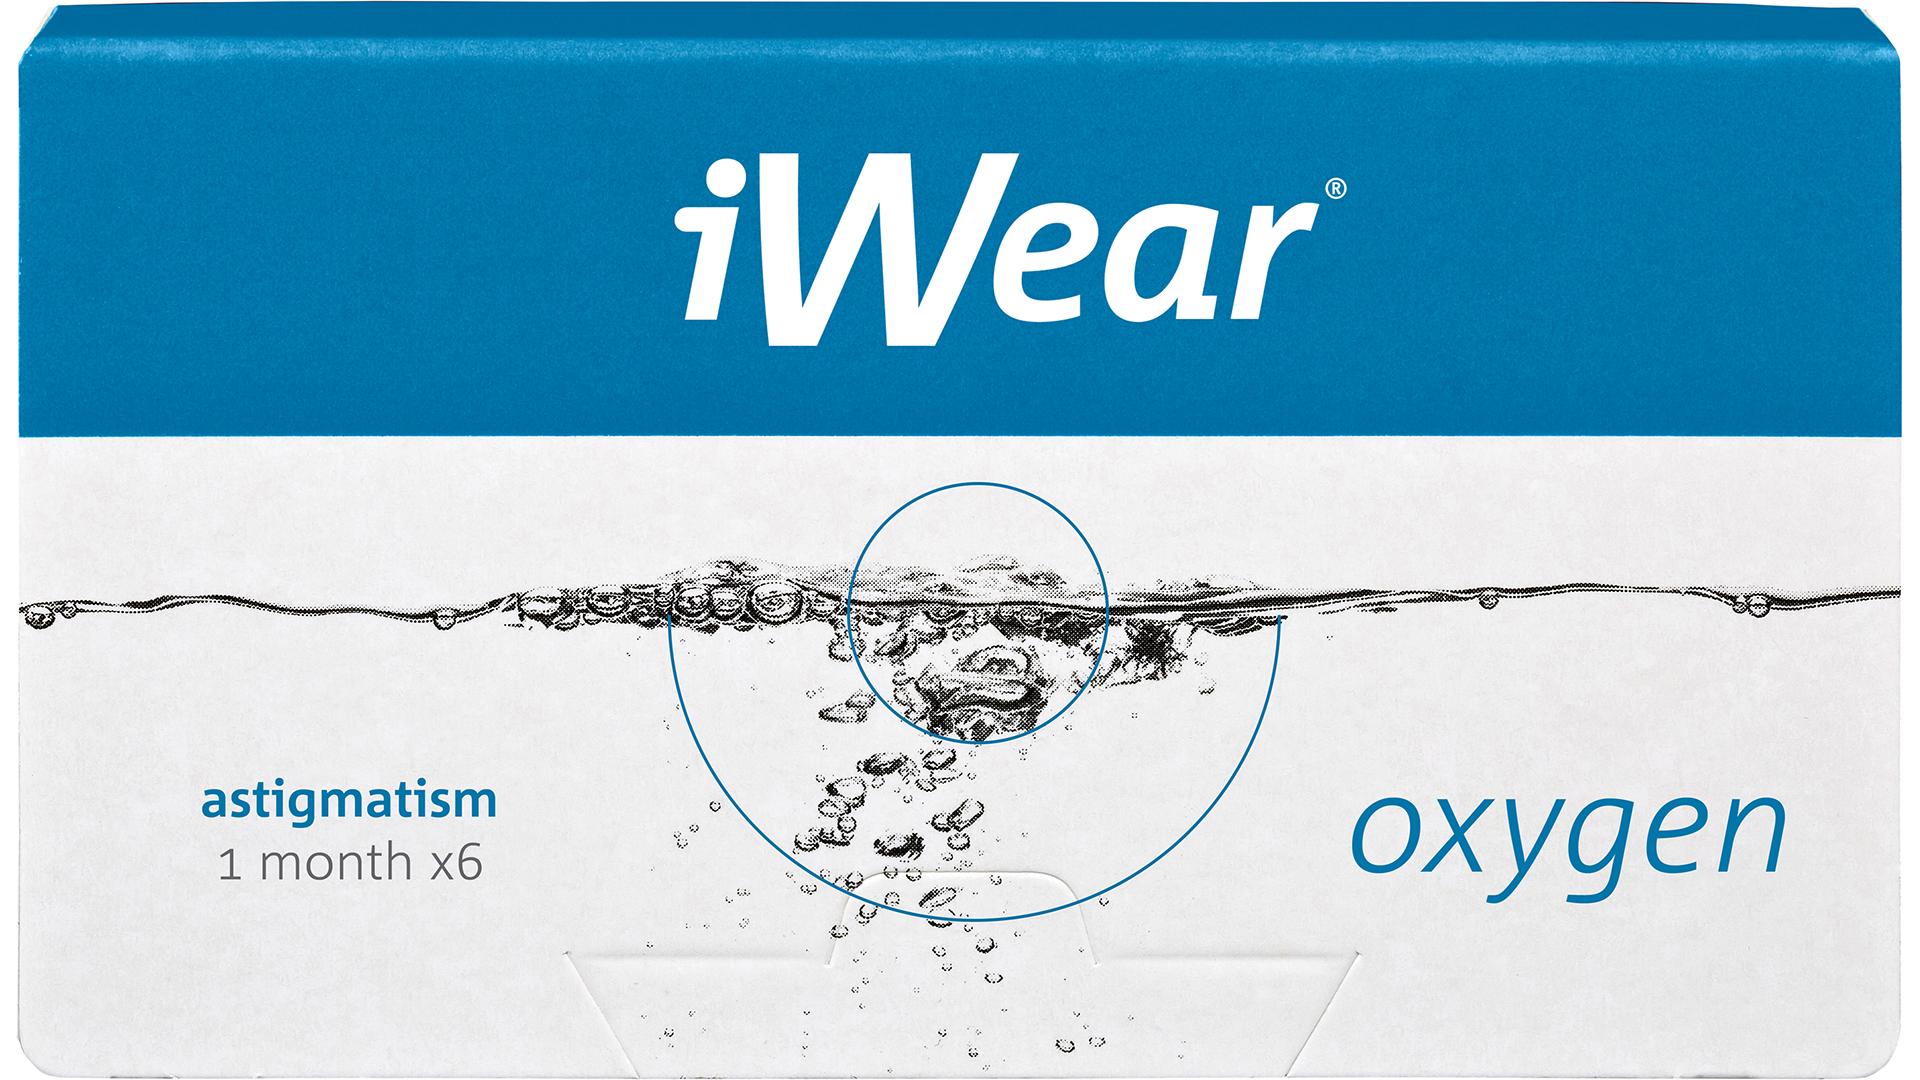 Front iWear oxygen astigmatism